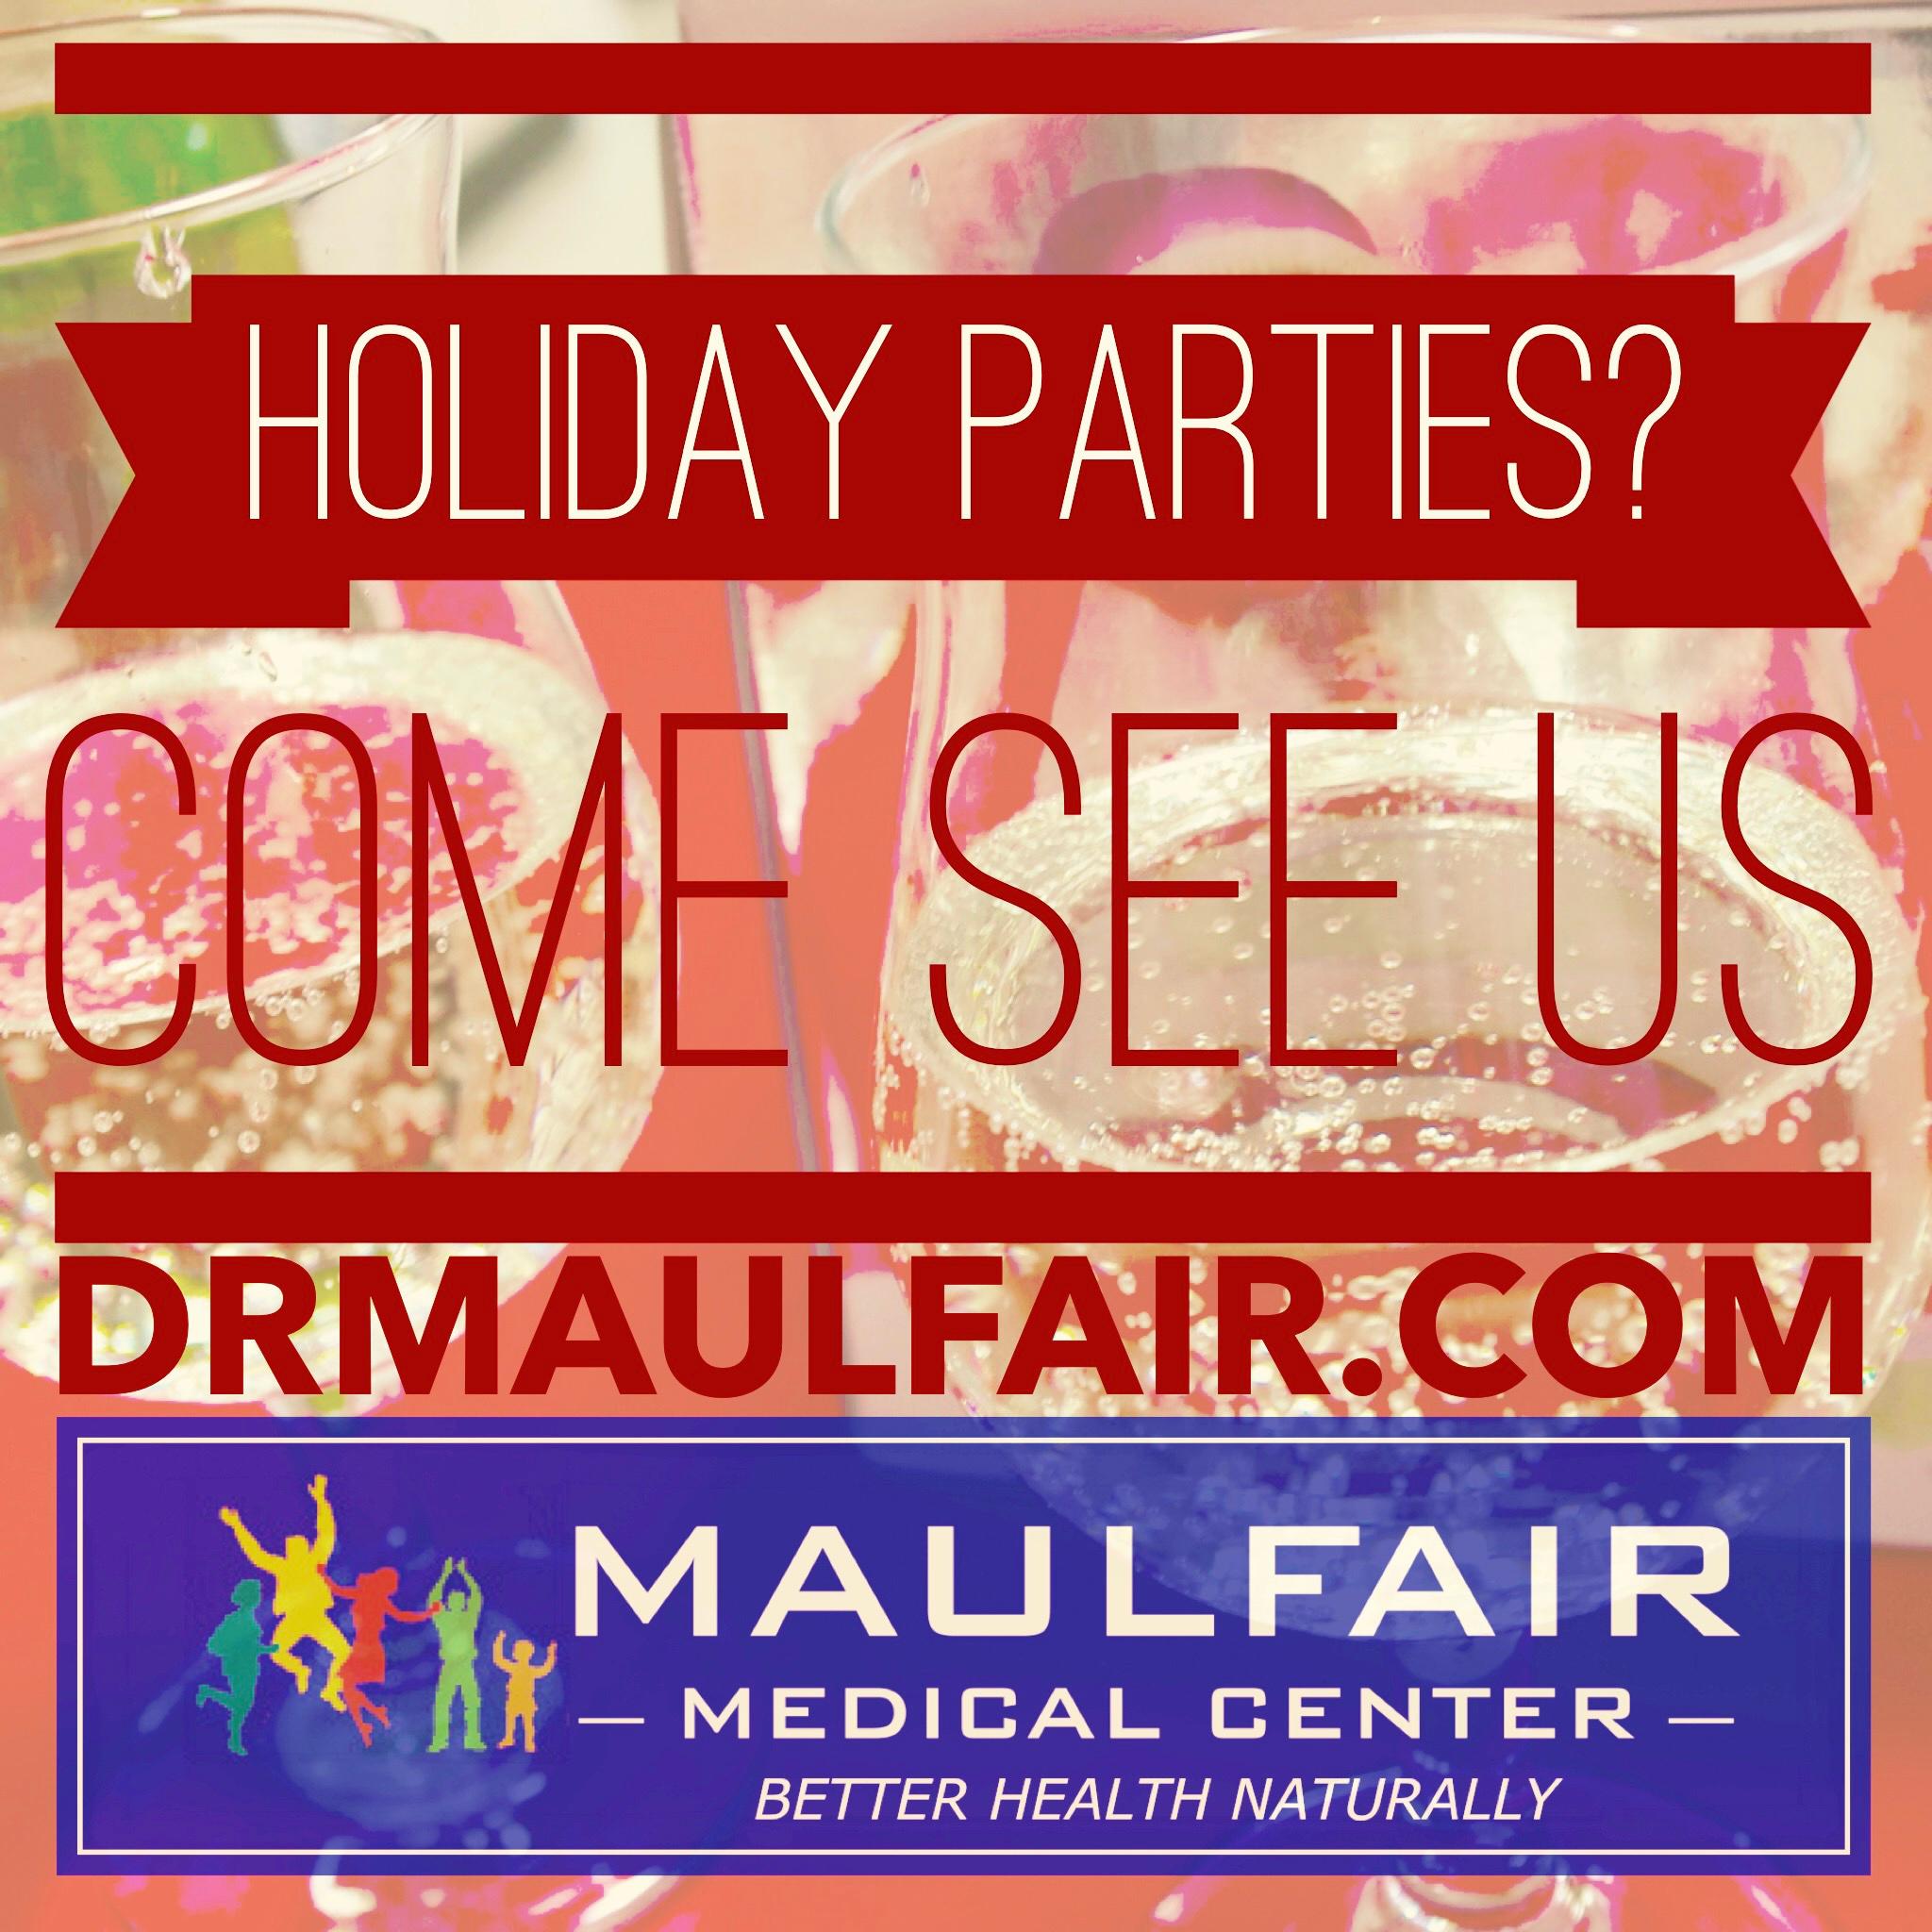 maulfair - holiday parties.jpg